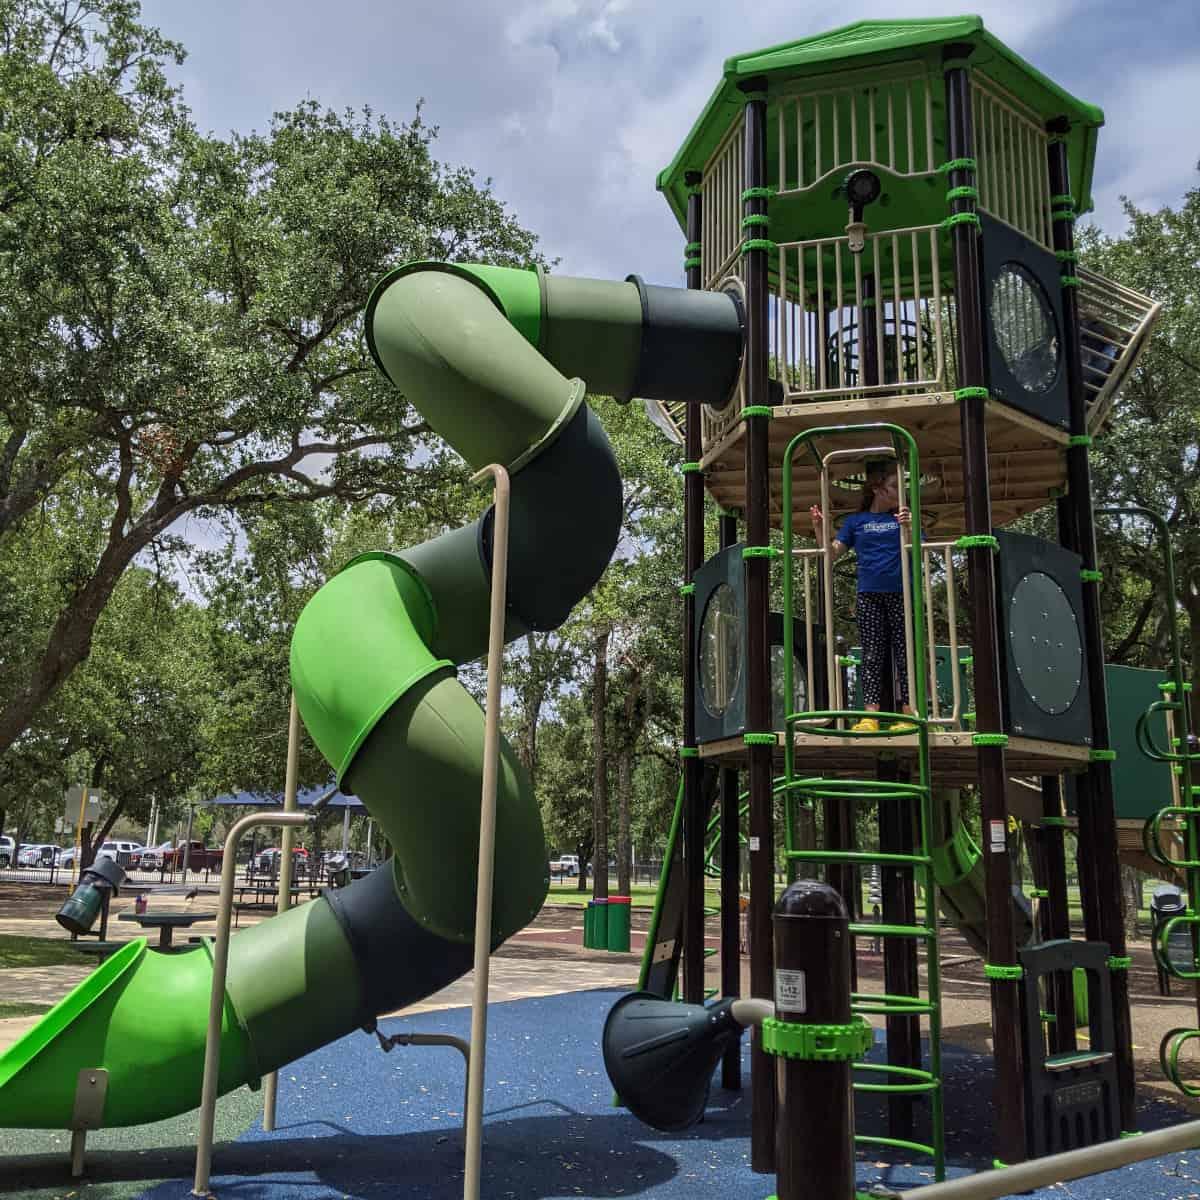 Mary Jo Peckham Park Playground